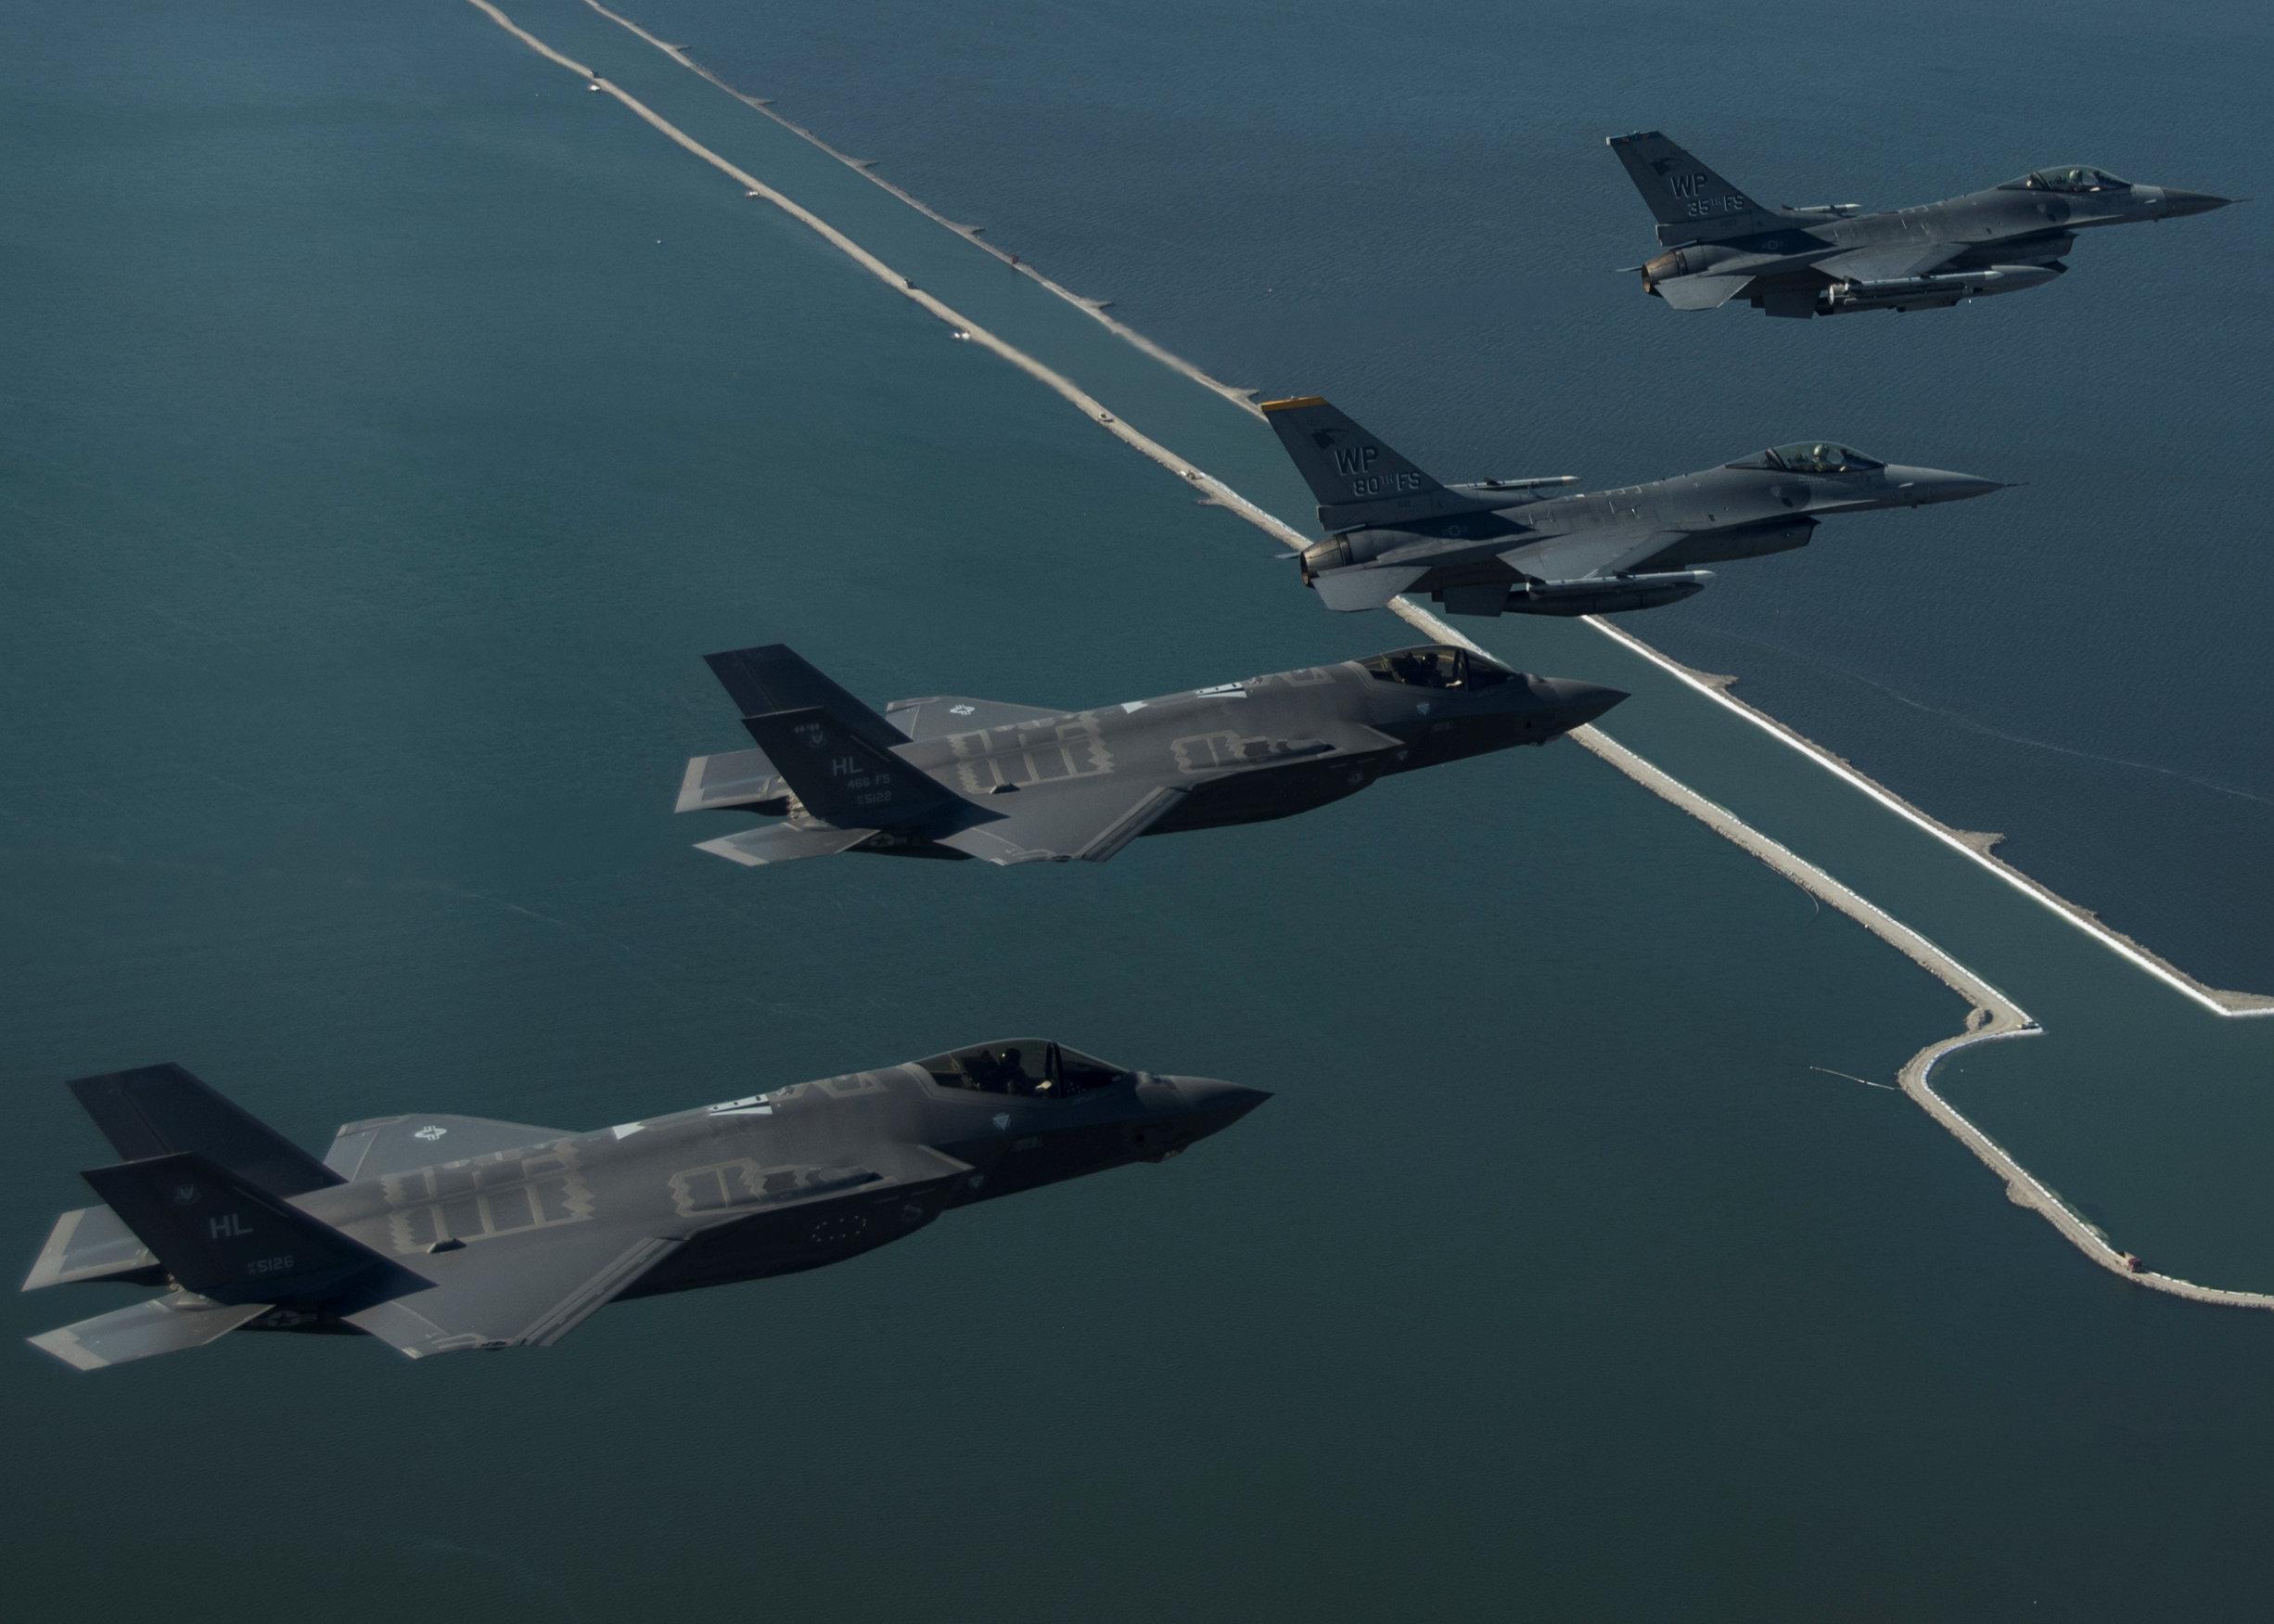 B-1B bomber joins U.S.-South Korea drills as tensions escalate